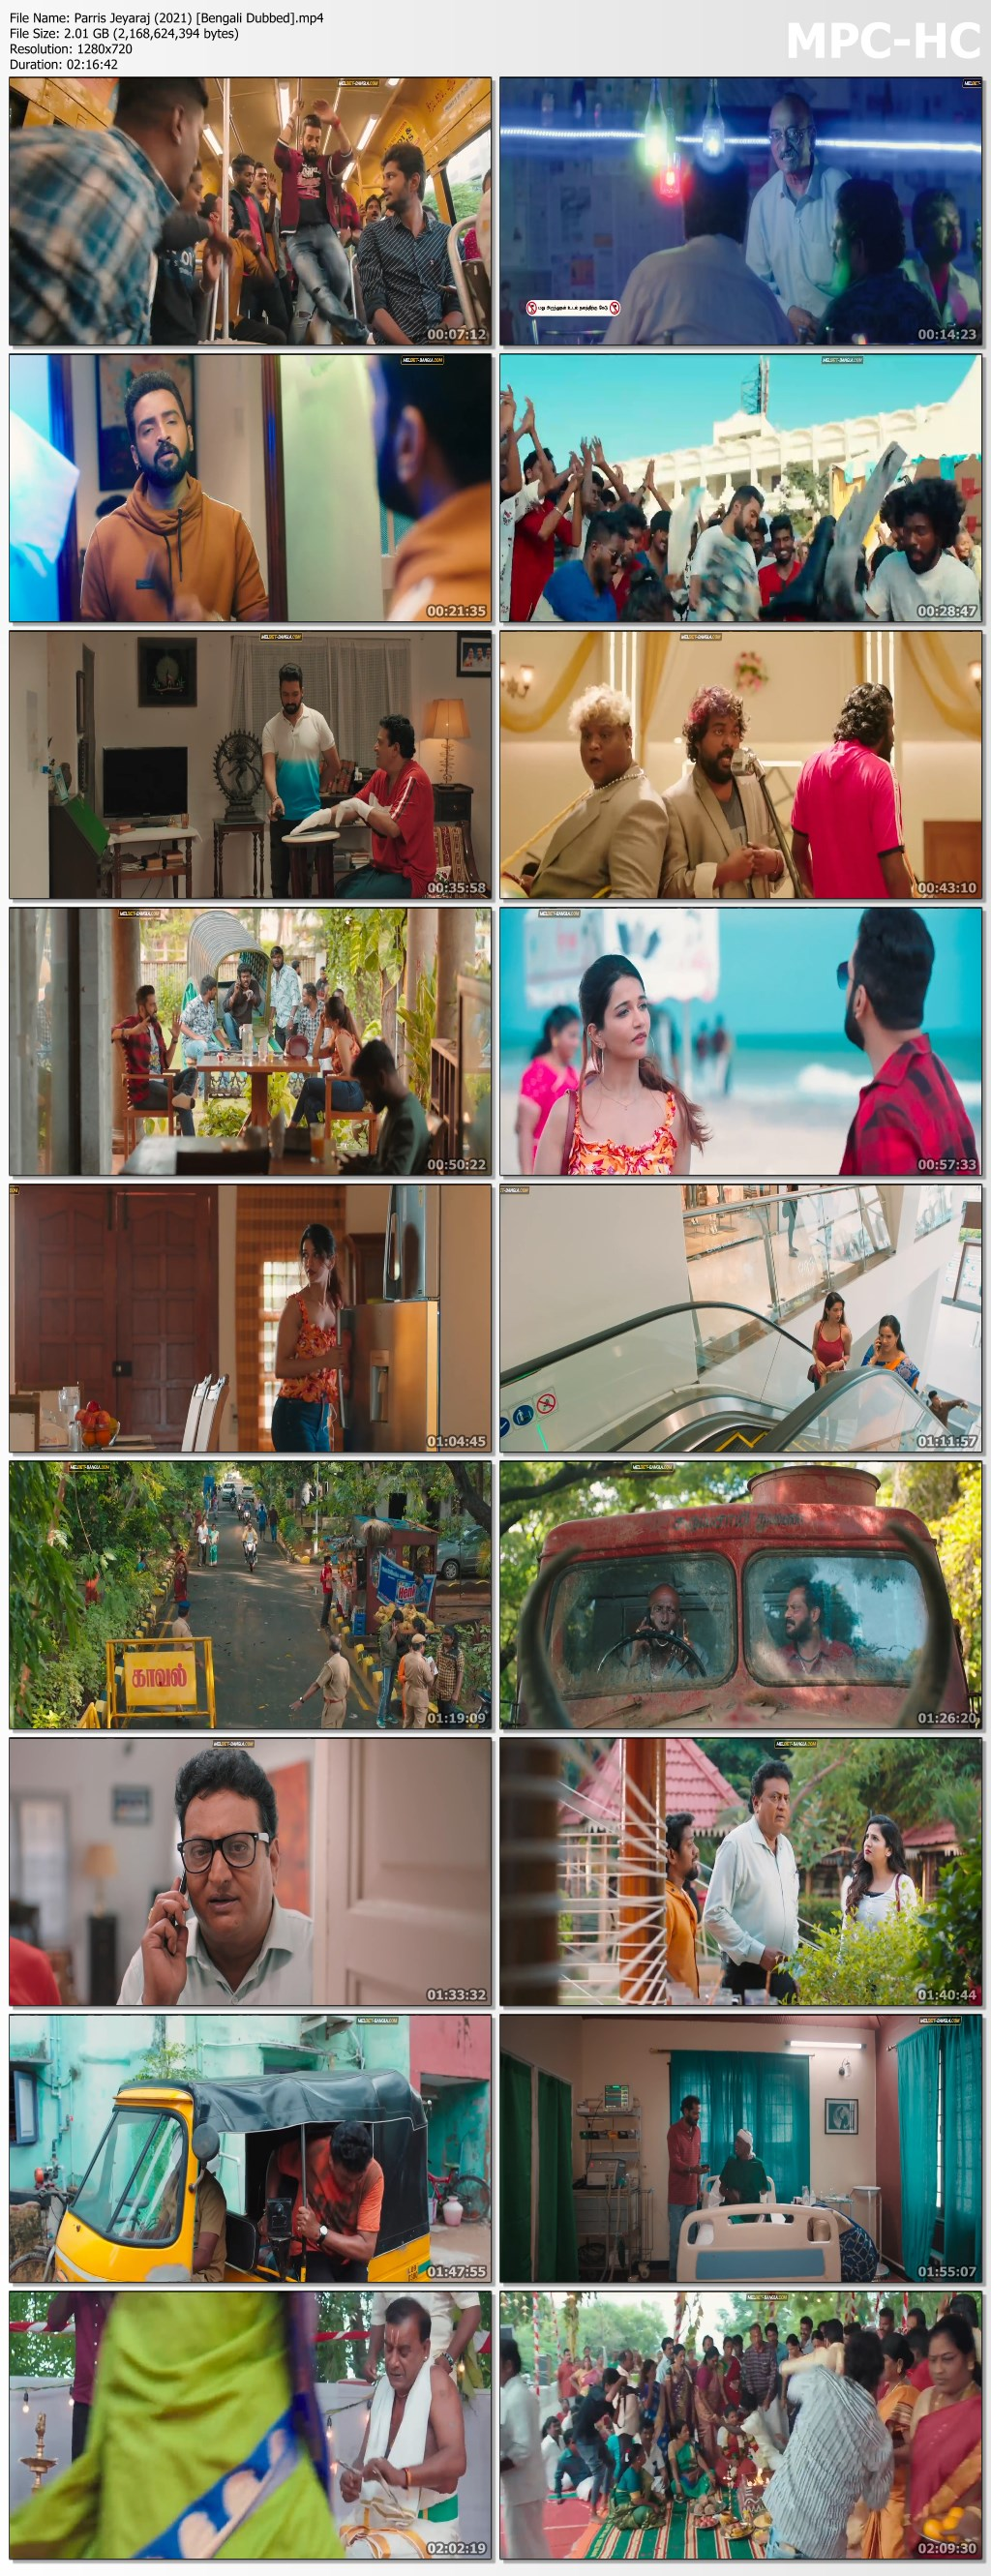 Parris Jeyaraj (2021) [Bengali Dubbed].mp4 thumbs